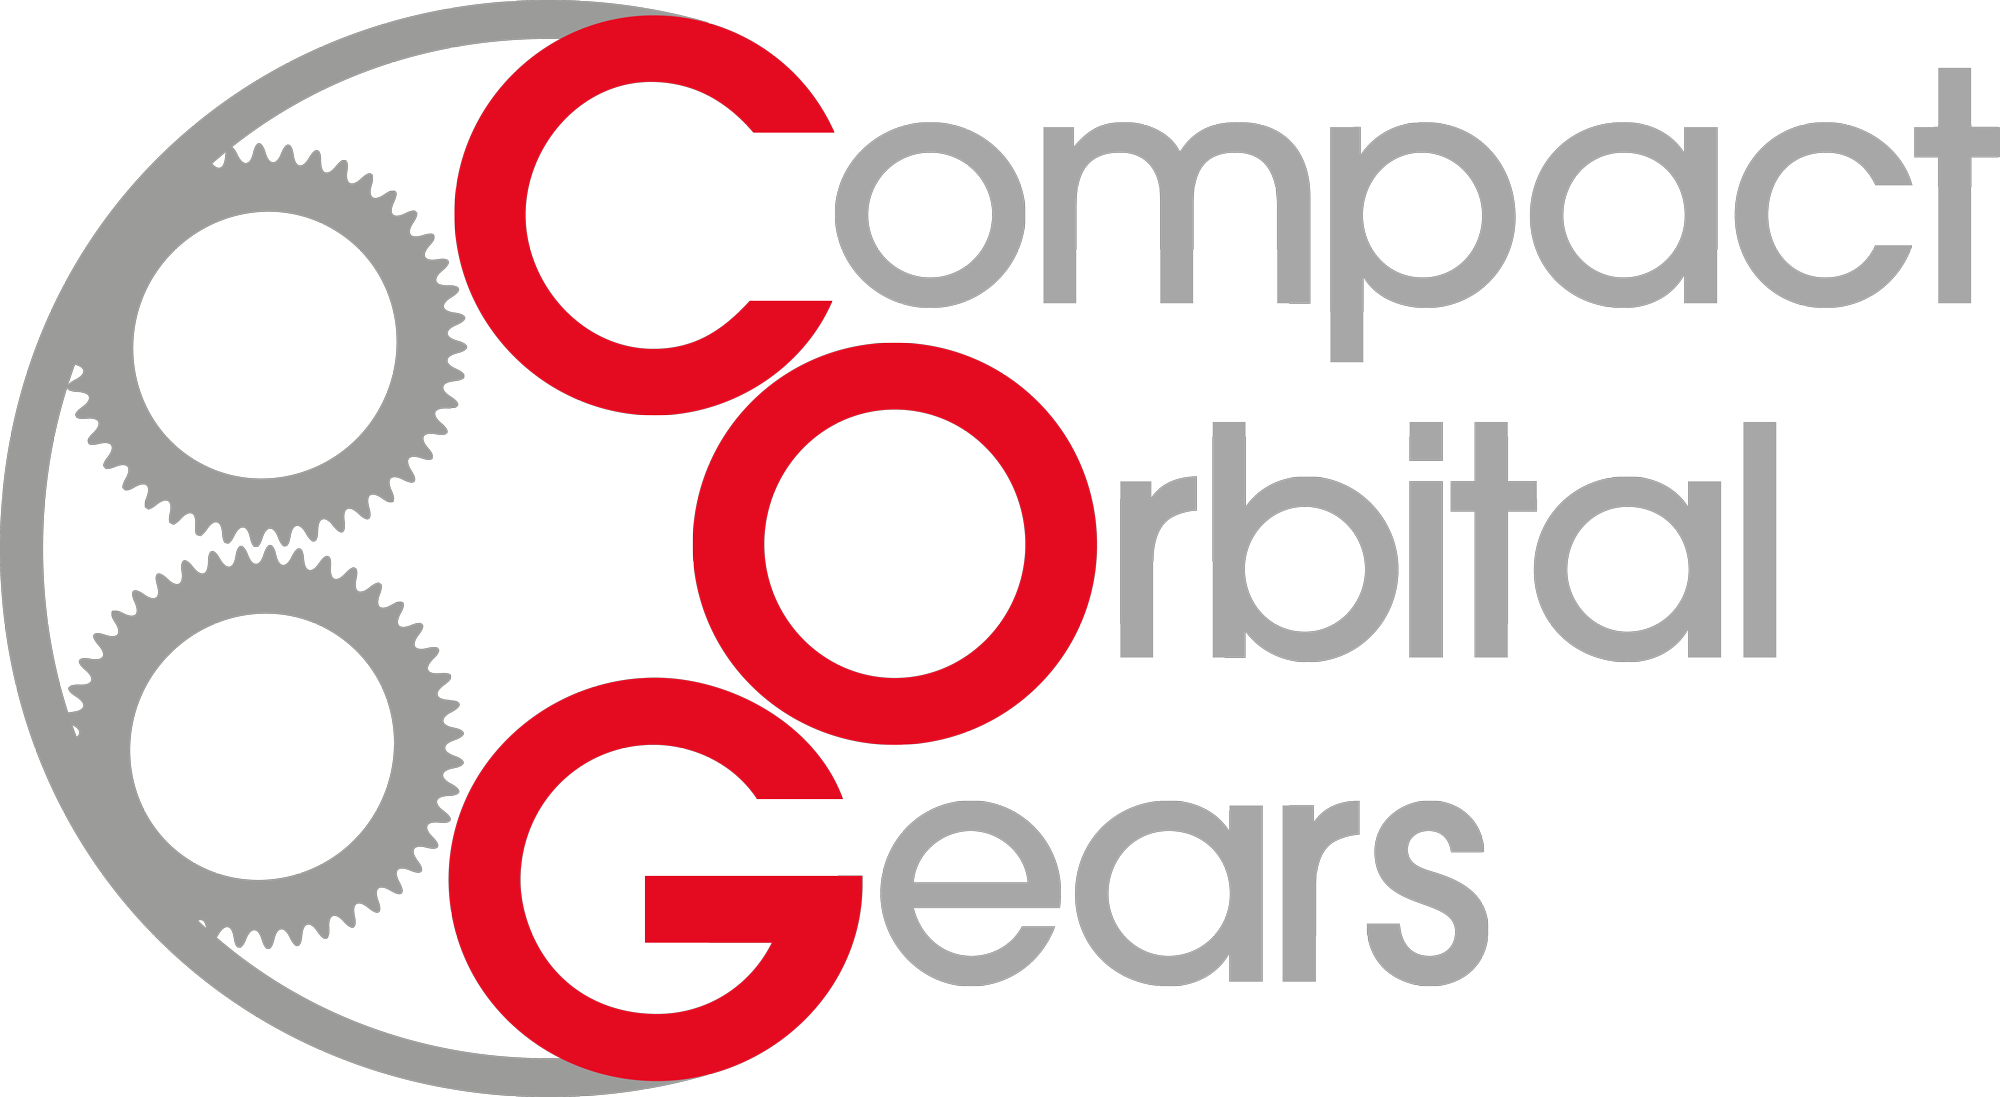 Compact Orbital Gears